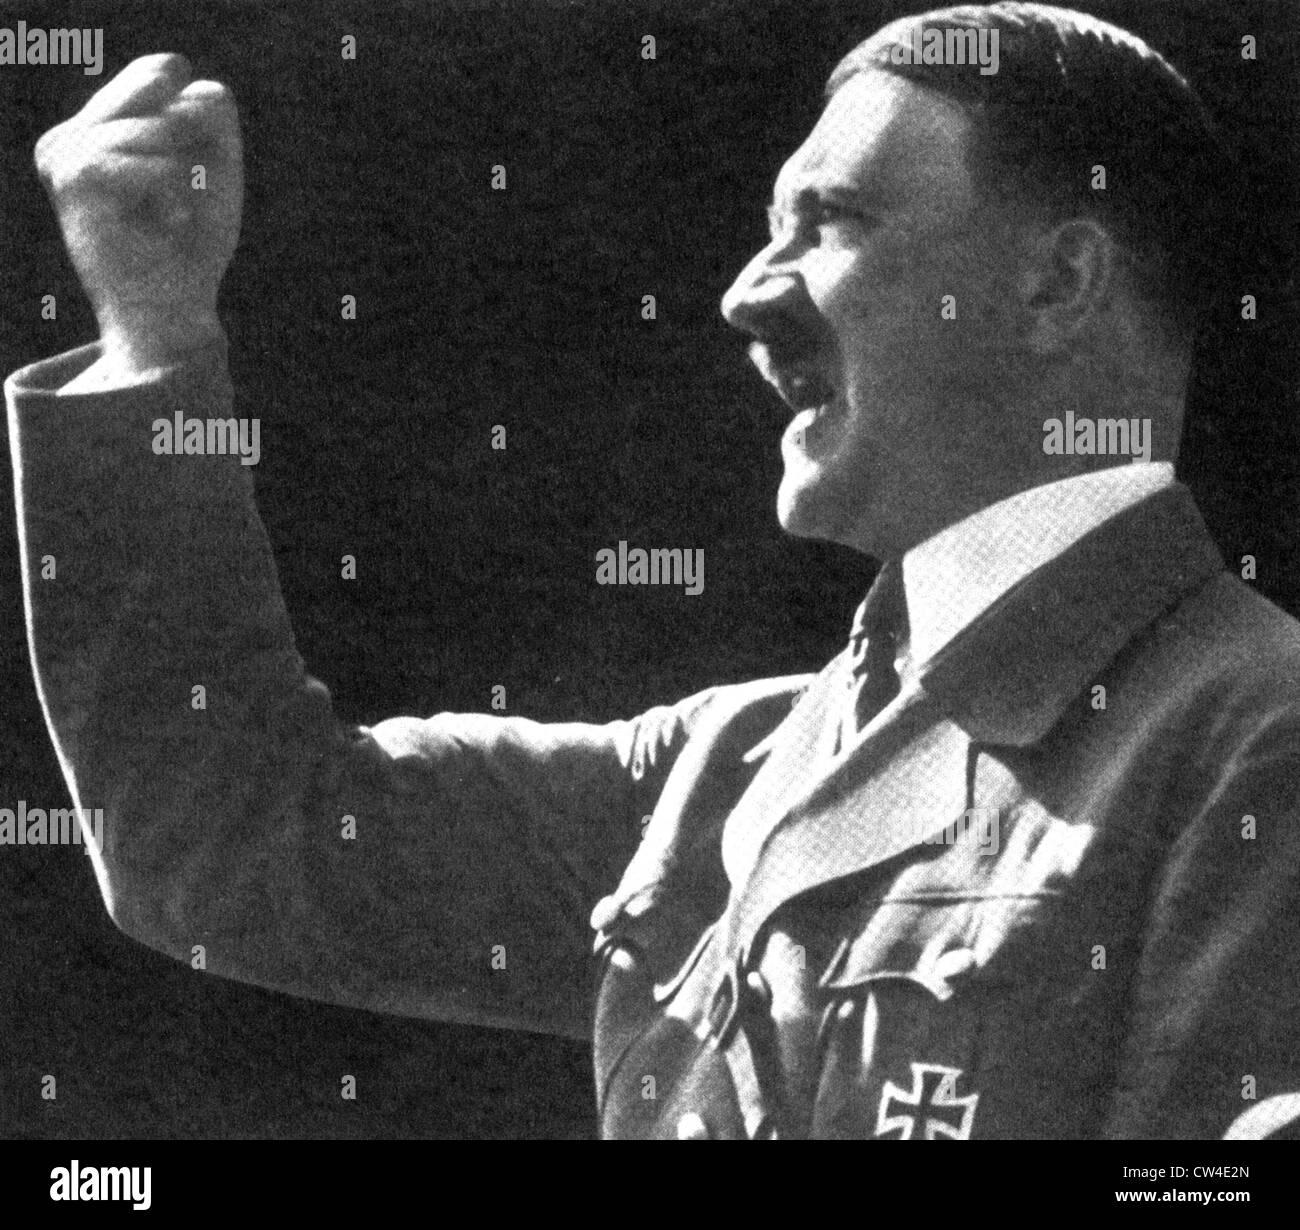 ADOLF HITLER (1889-1945) German Facist leader - Stock Image